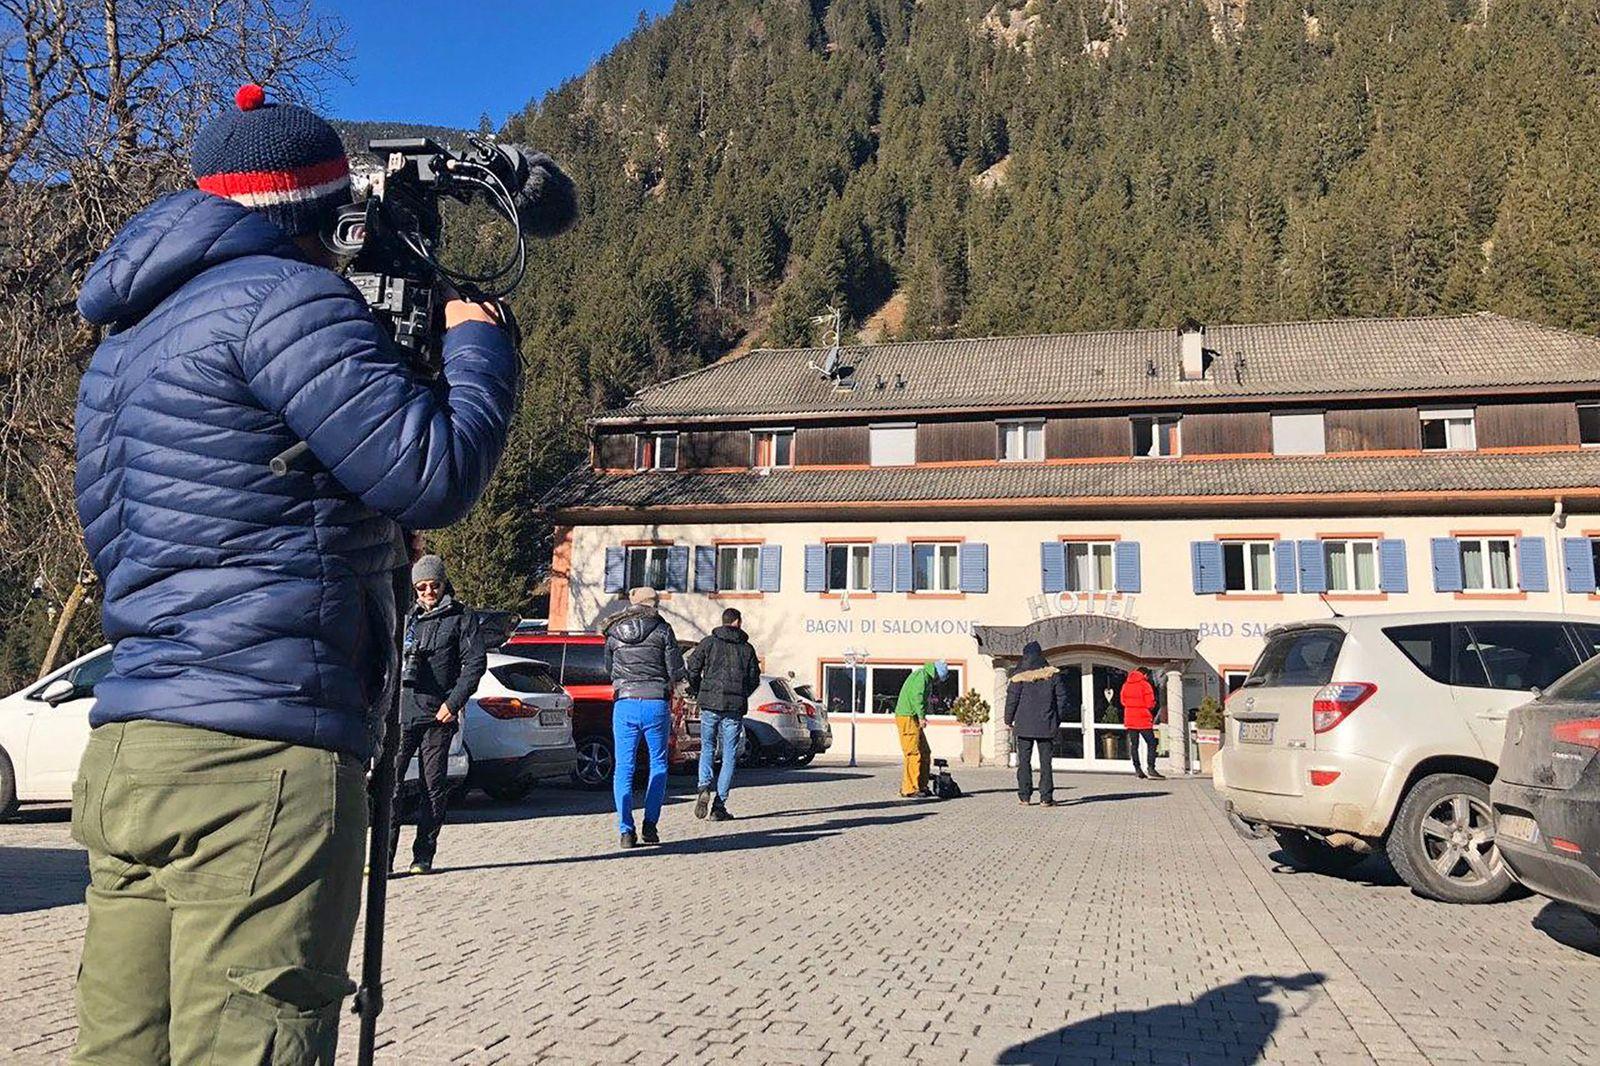 Biathlon WM Antholz - Doping-Vorwürfe